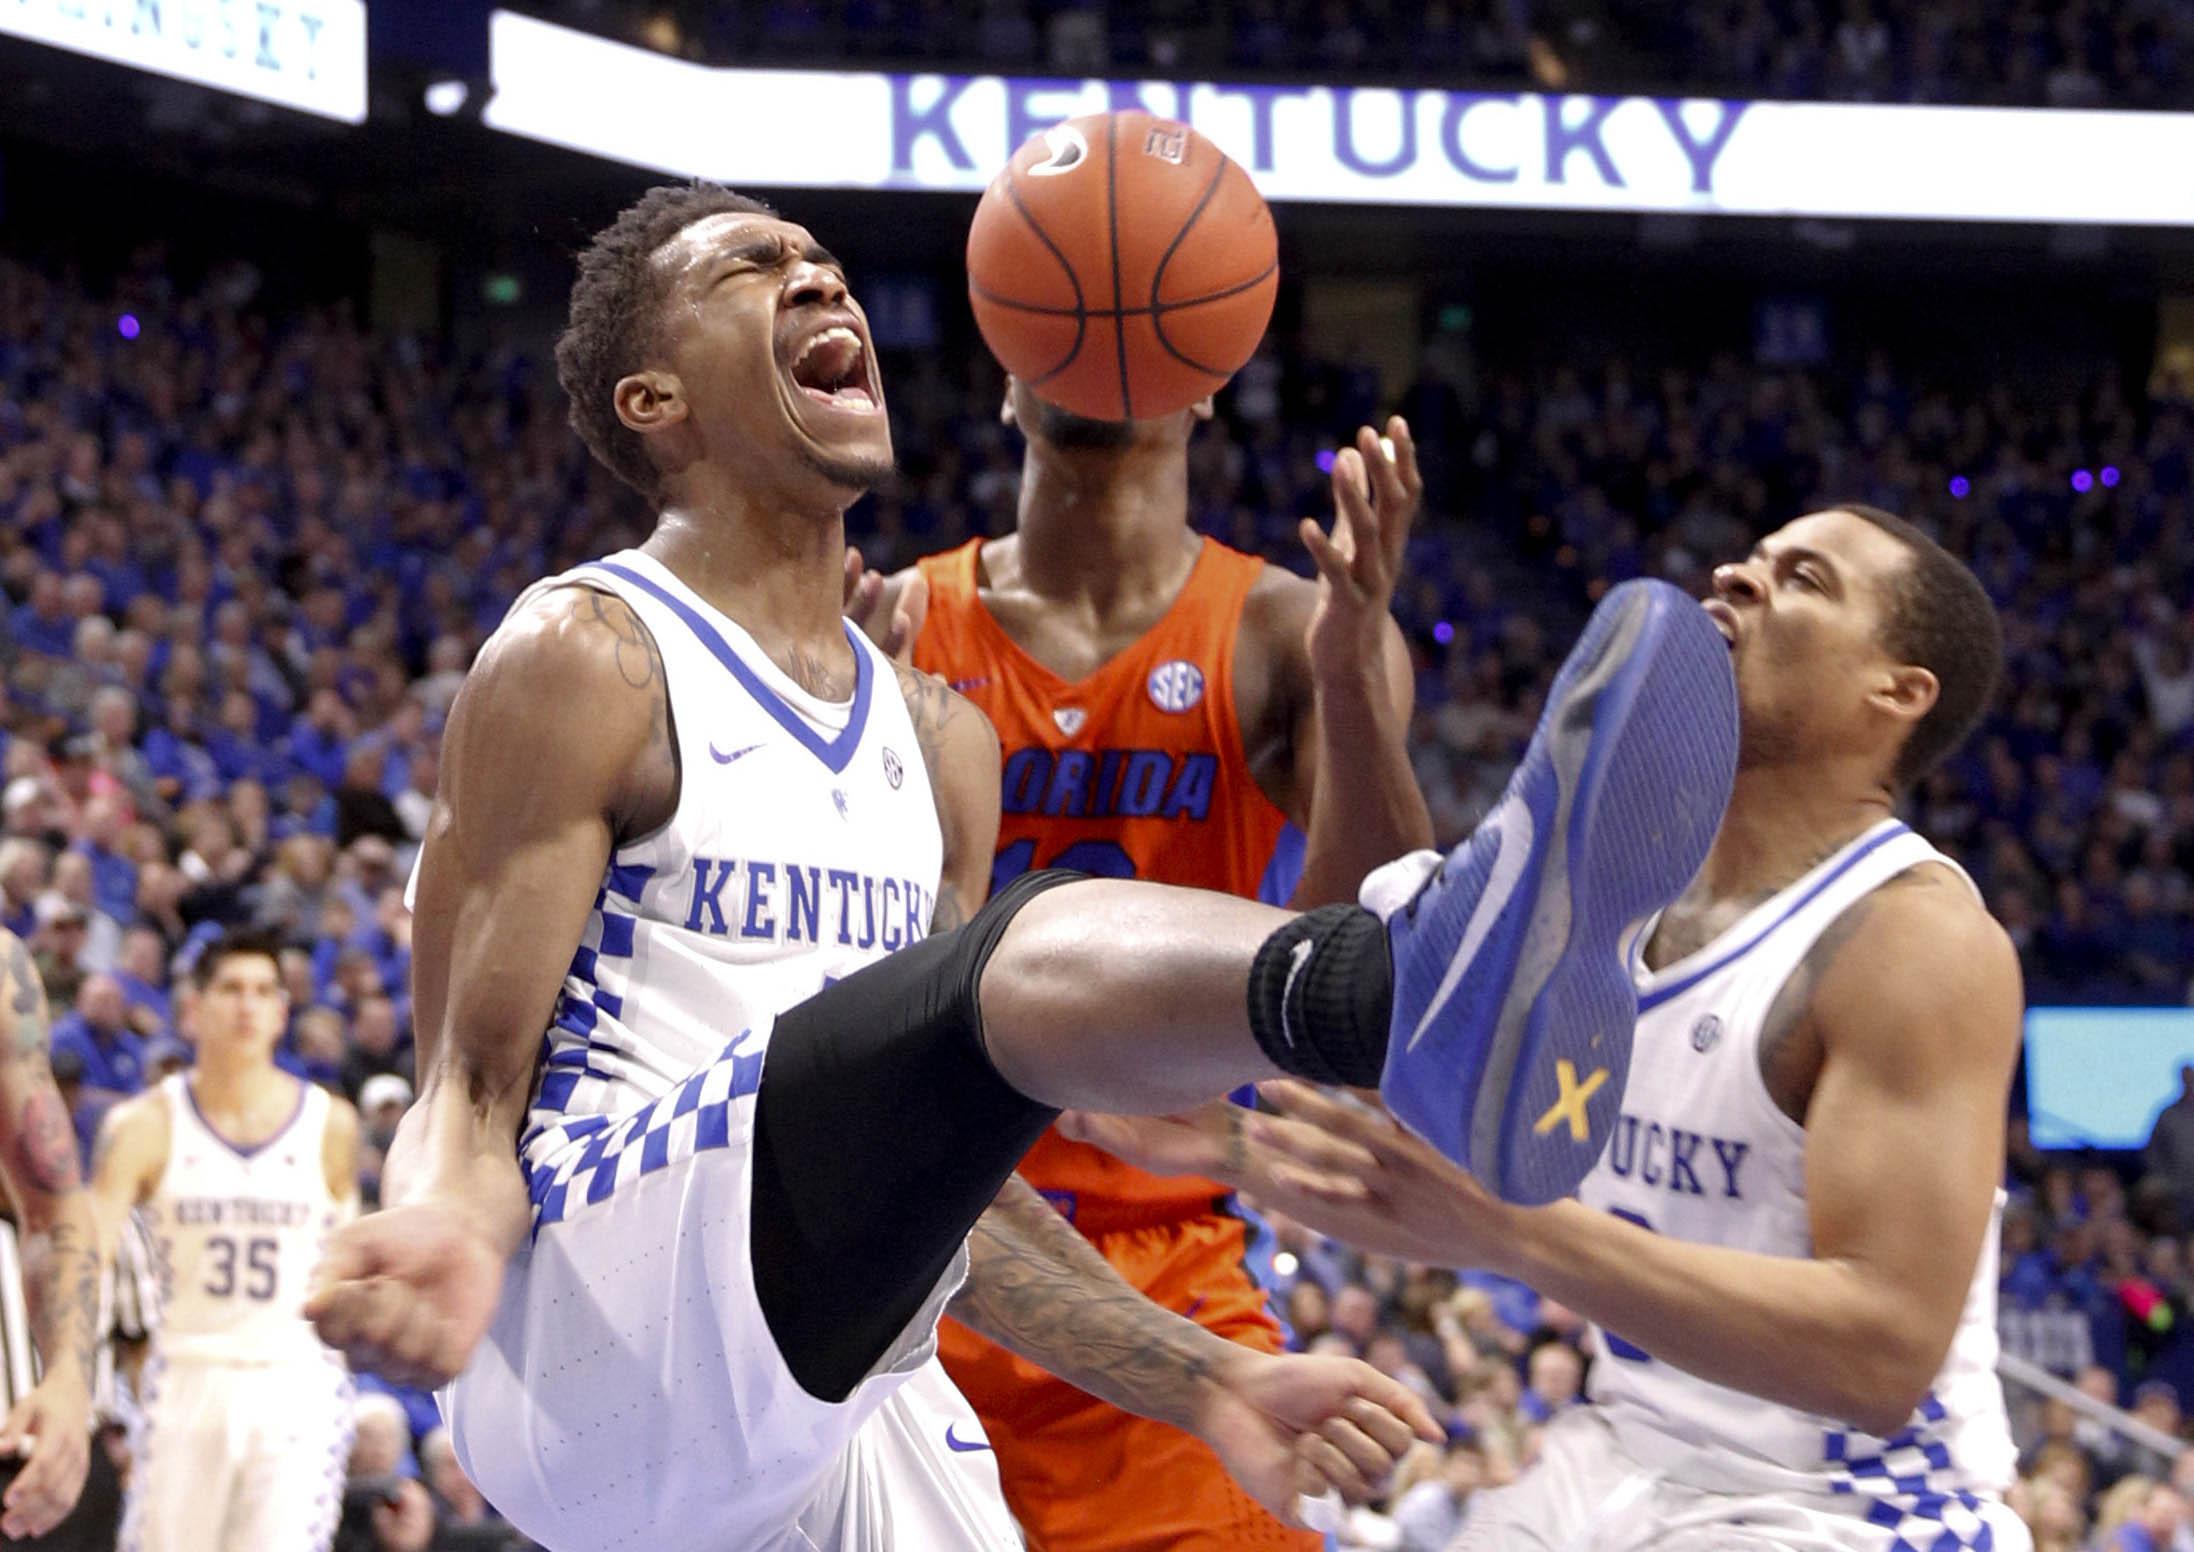 Kentucky Basketball: John Calipari's 2017 Recruiting Class